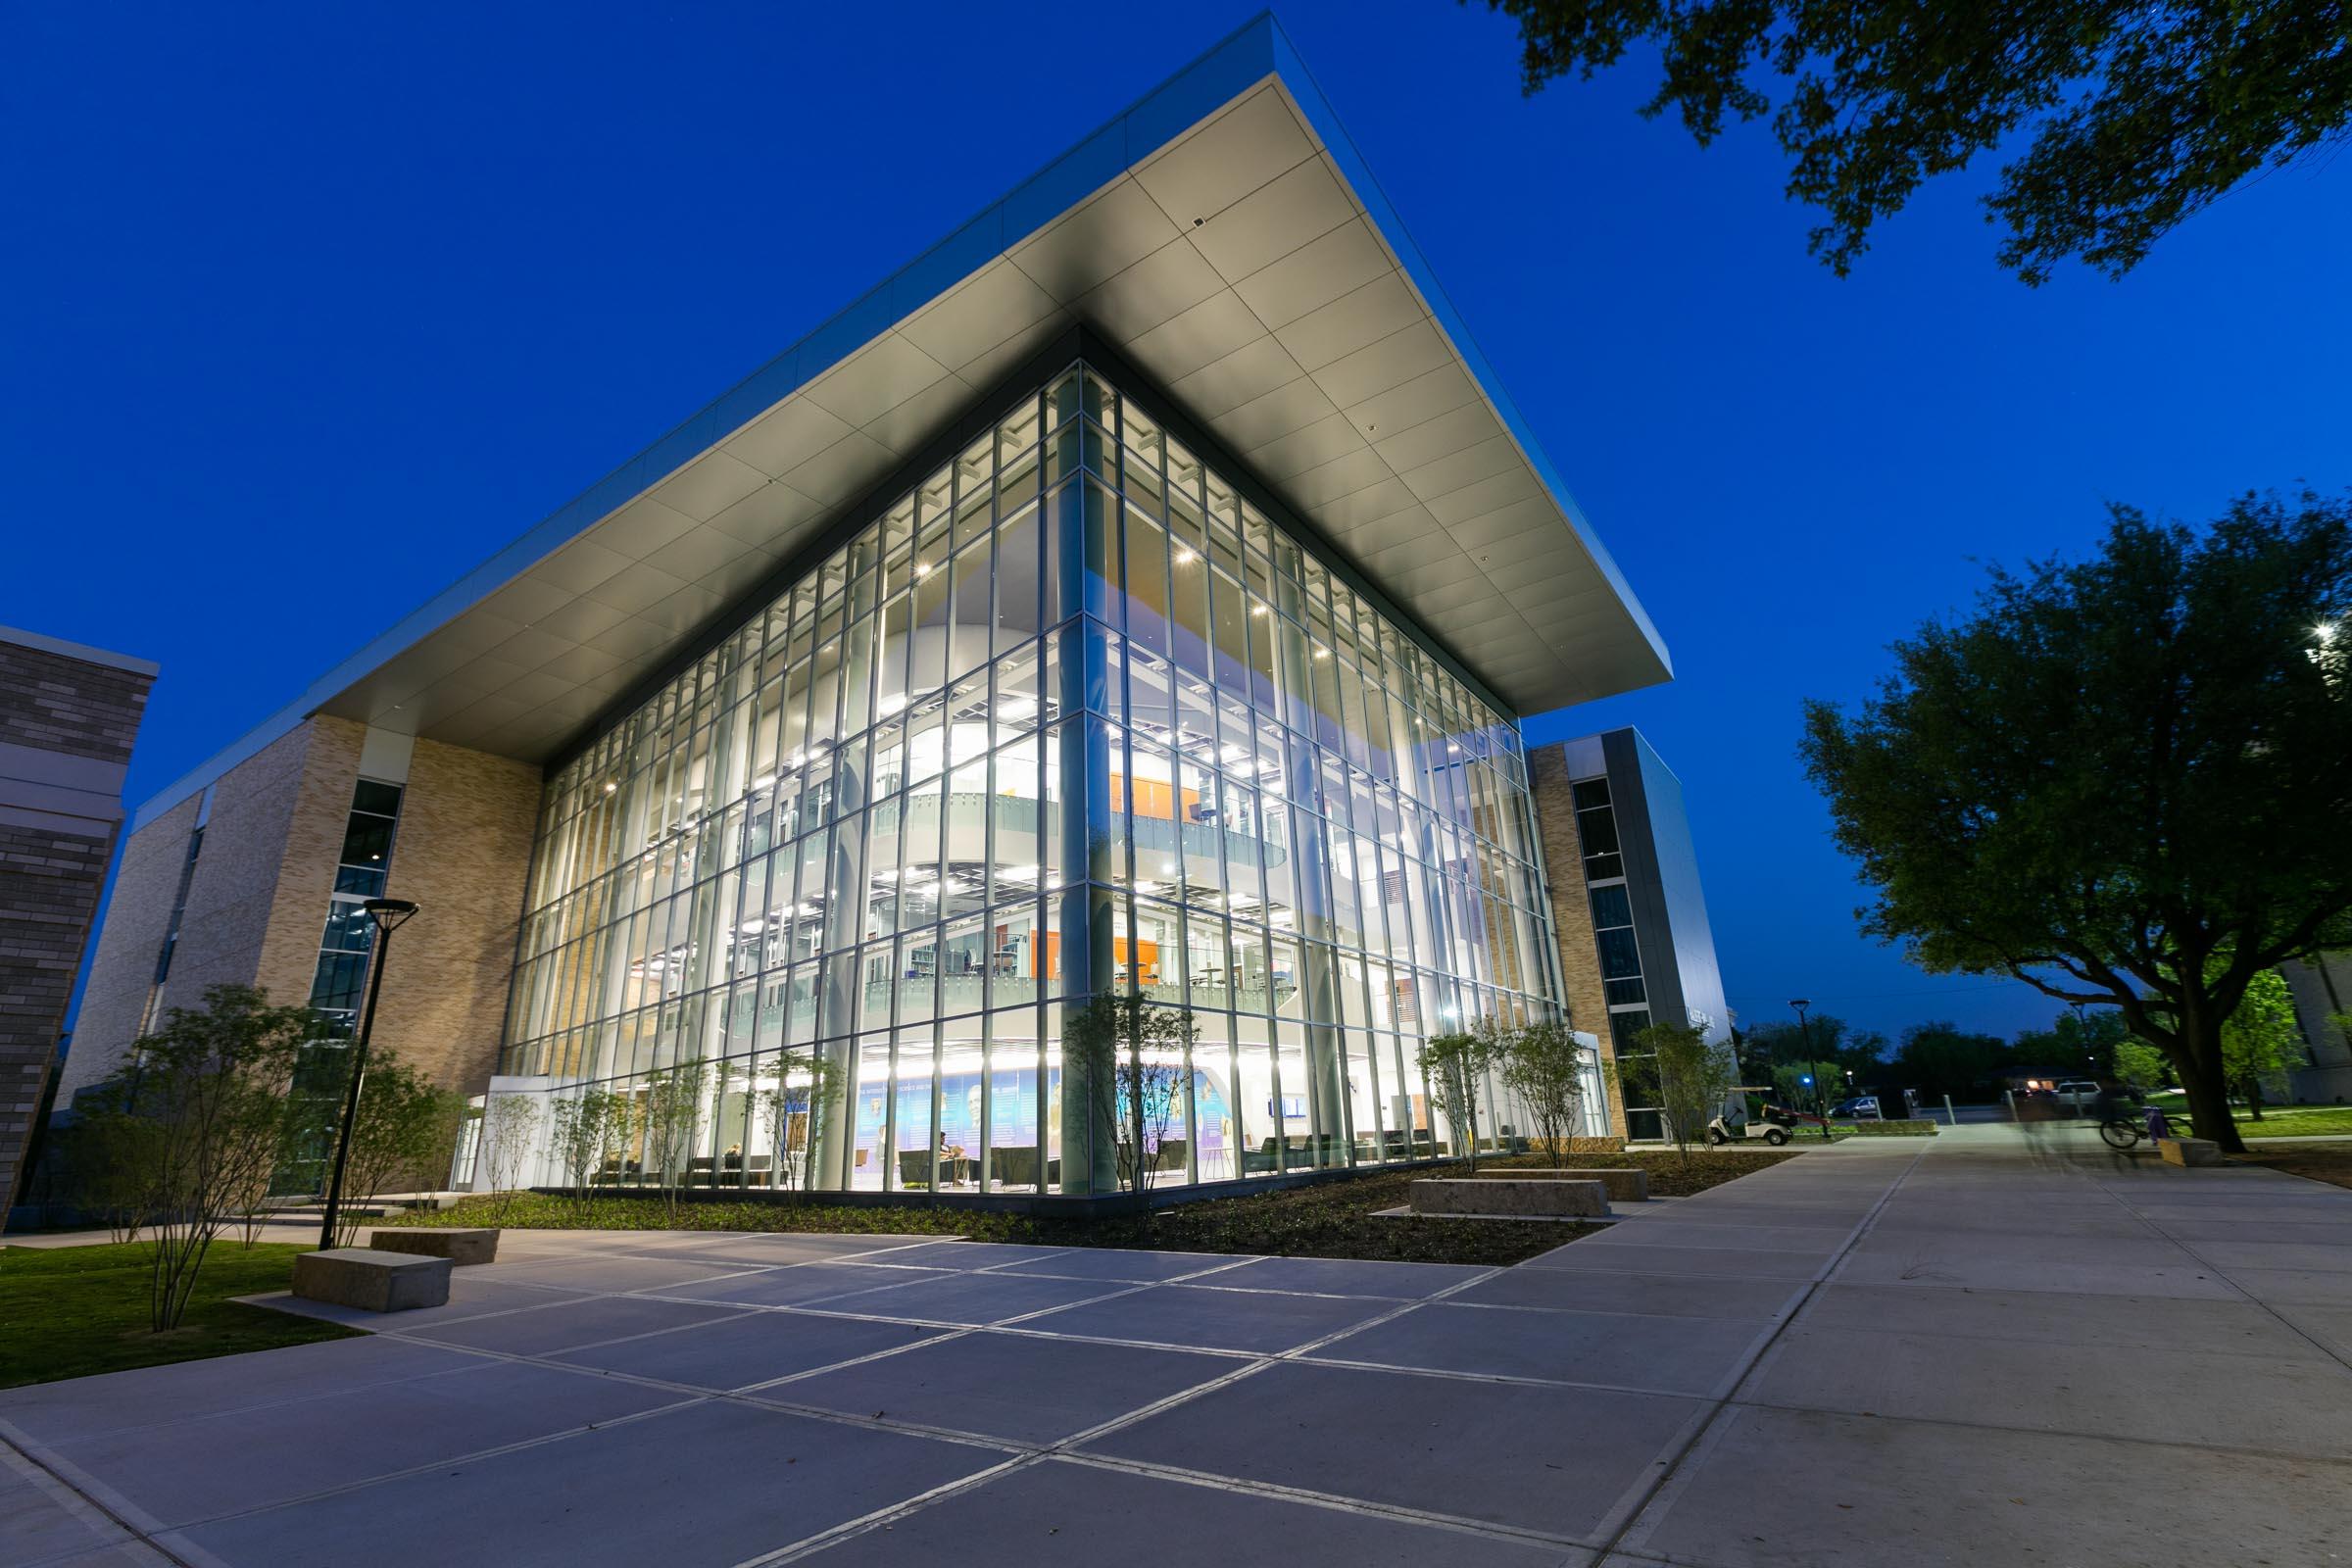 ACU Halbert-Walling Research Center